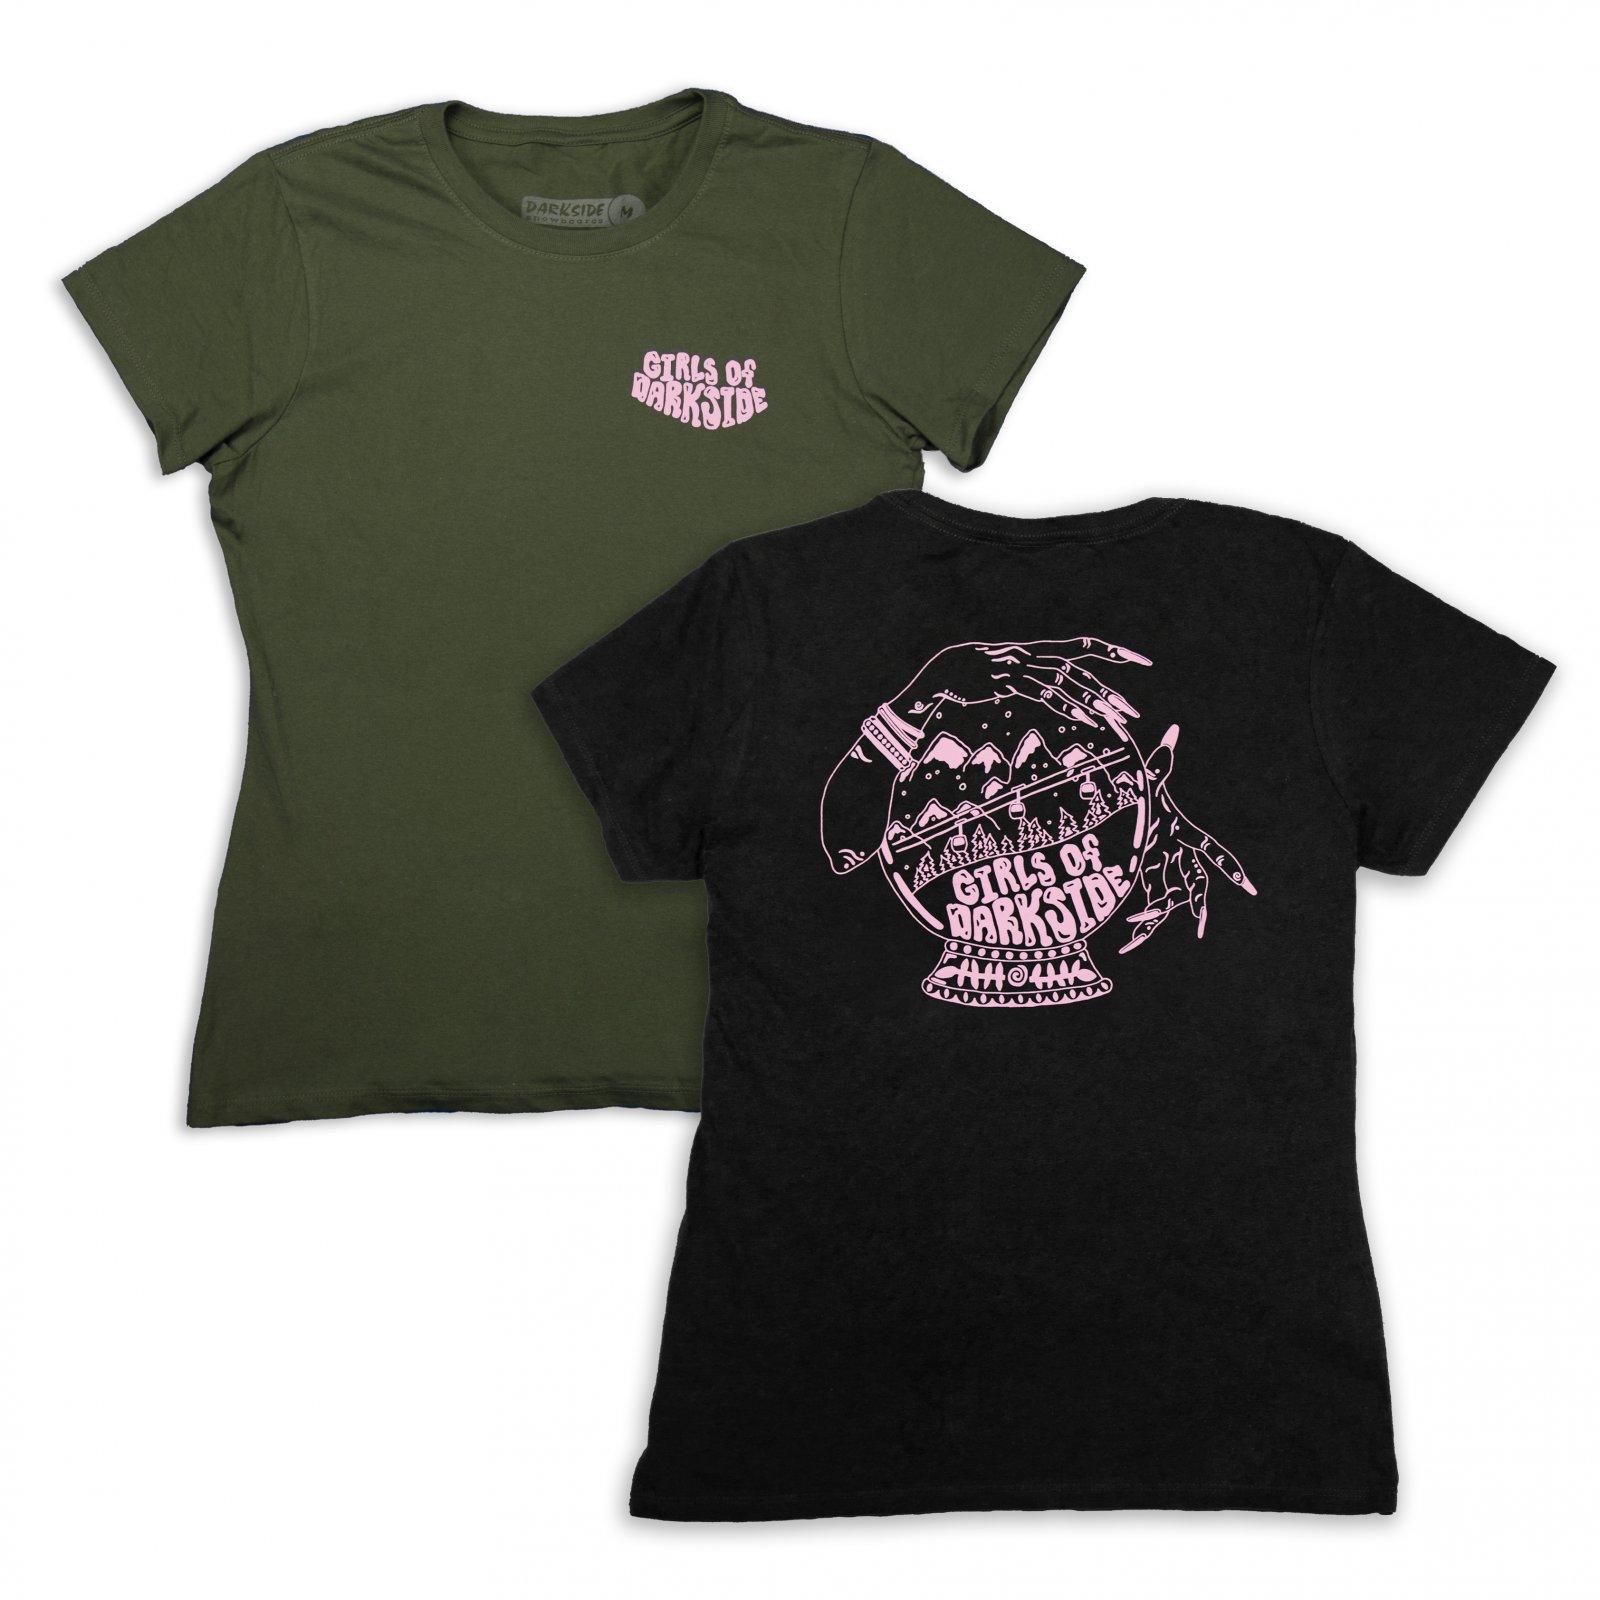 Girls of Darkside Crystal Ball Short Sleeve Shirt